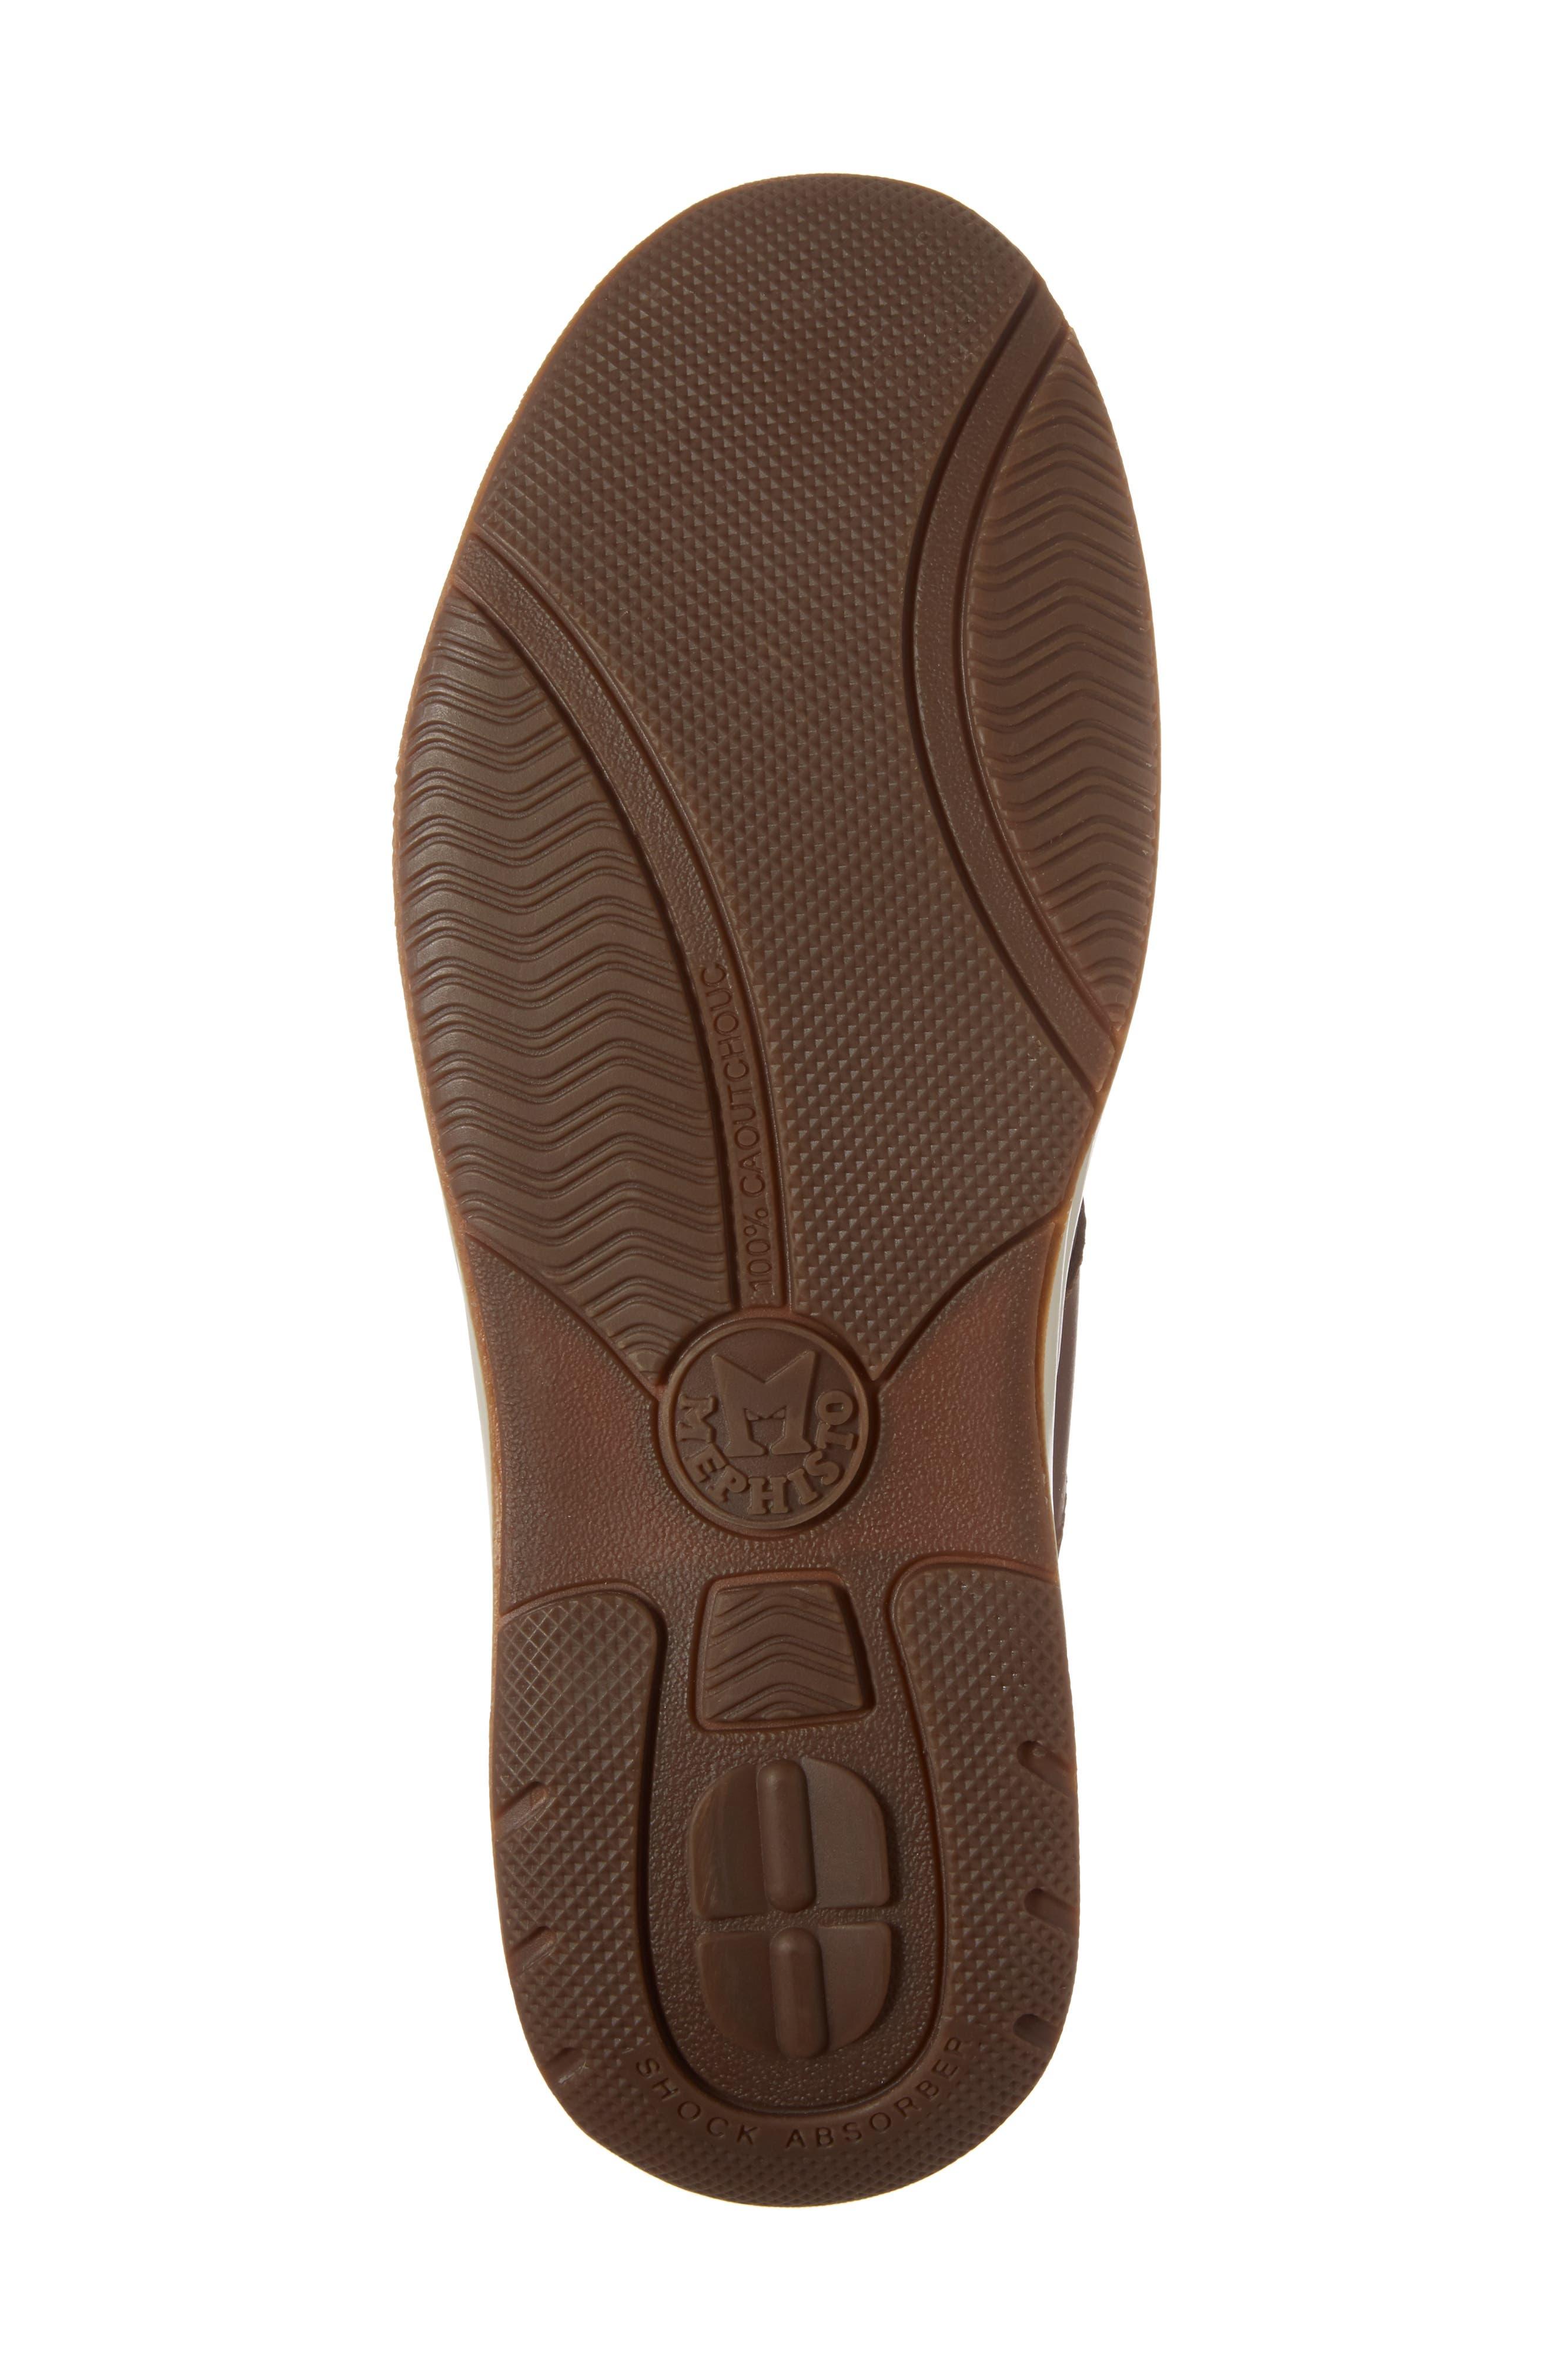 'Hero' Perforated Sneaker,                             Alternate thumbnail 6, color,                             Chestnut Nubuck Leather